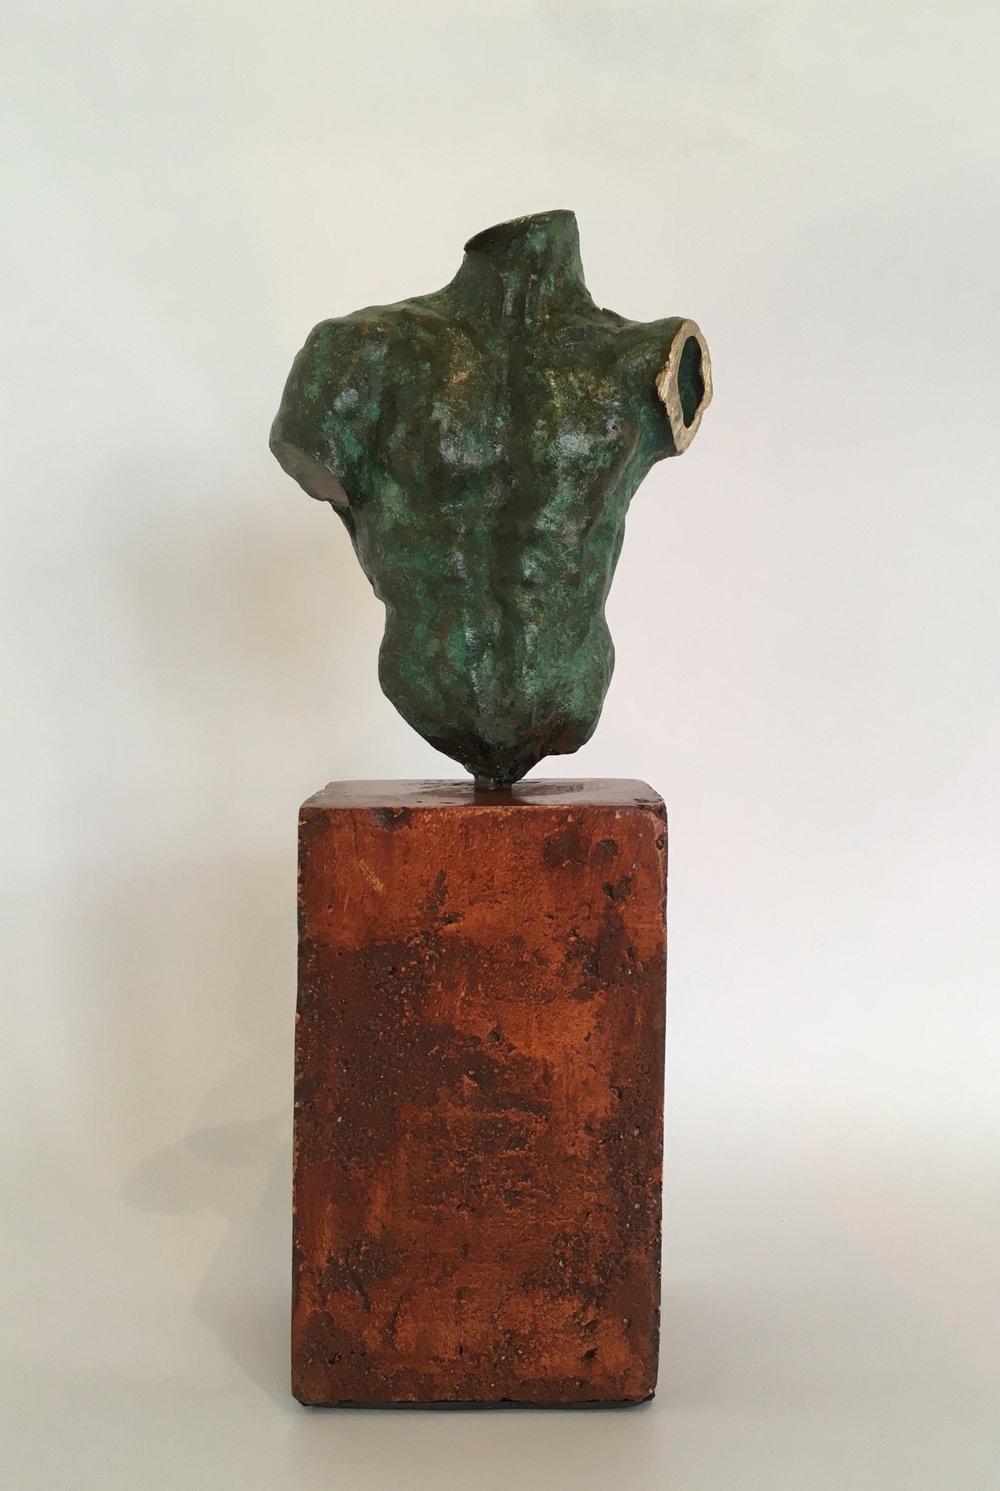 Title: Torso I  Size: H 28 cm  Medium: Bronze Edition 1/1  Price: £1500